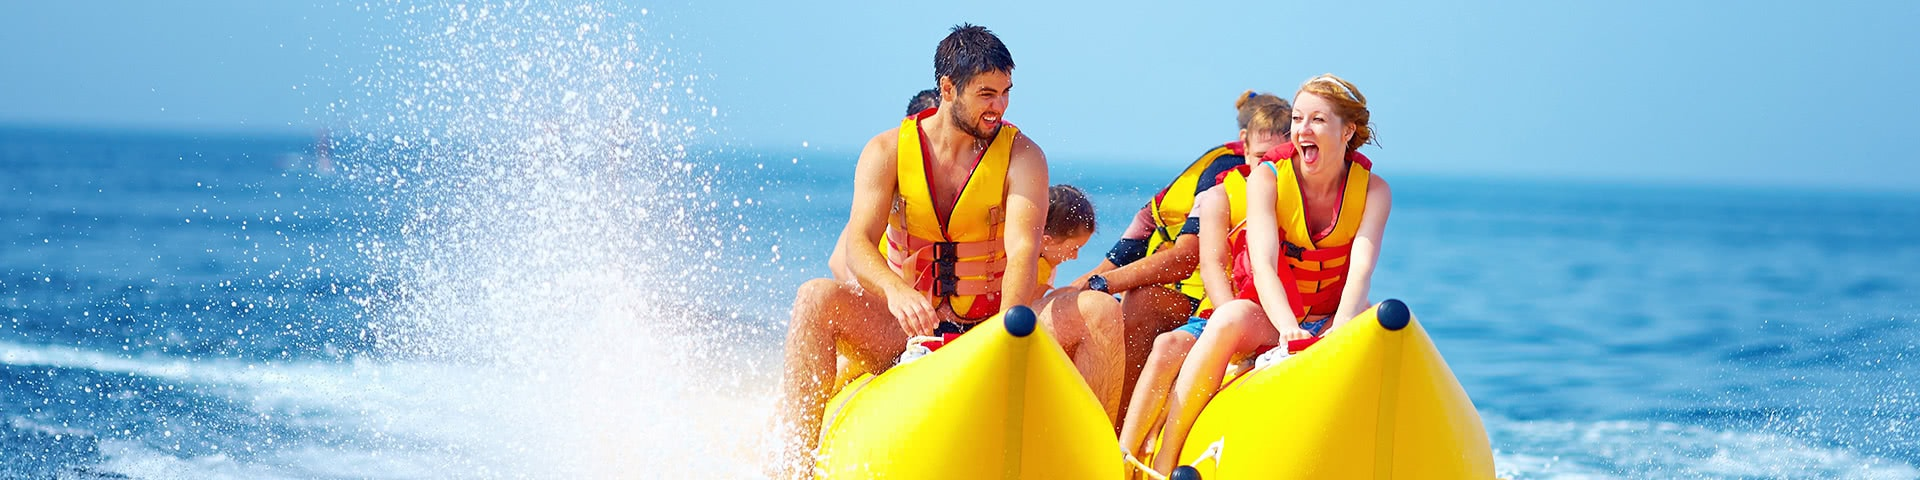 Bananenboot fahren auf Mallorca